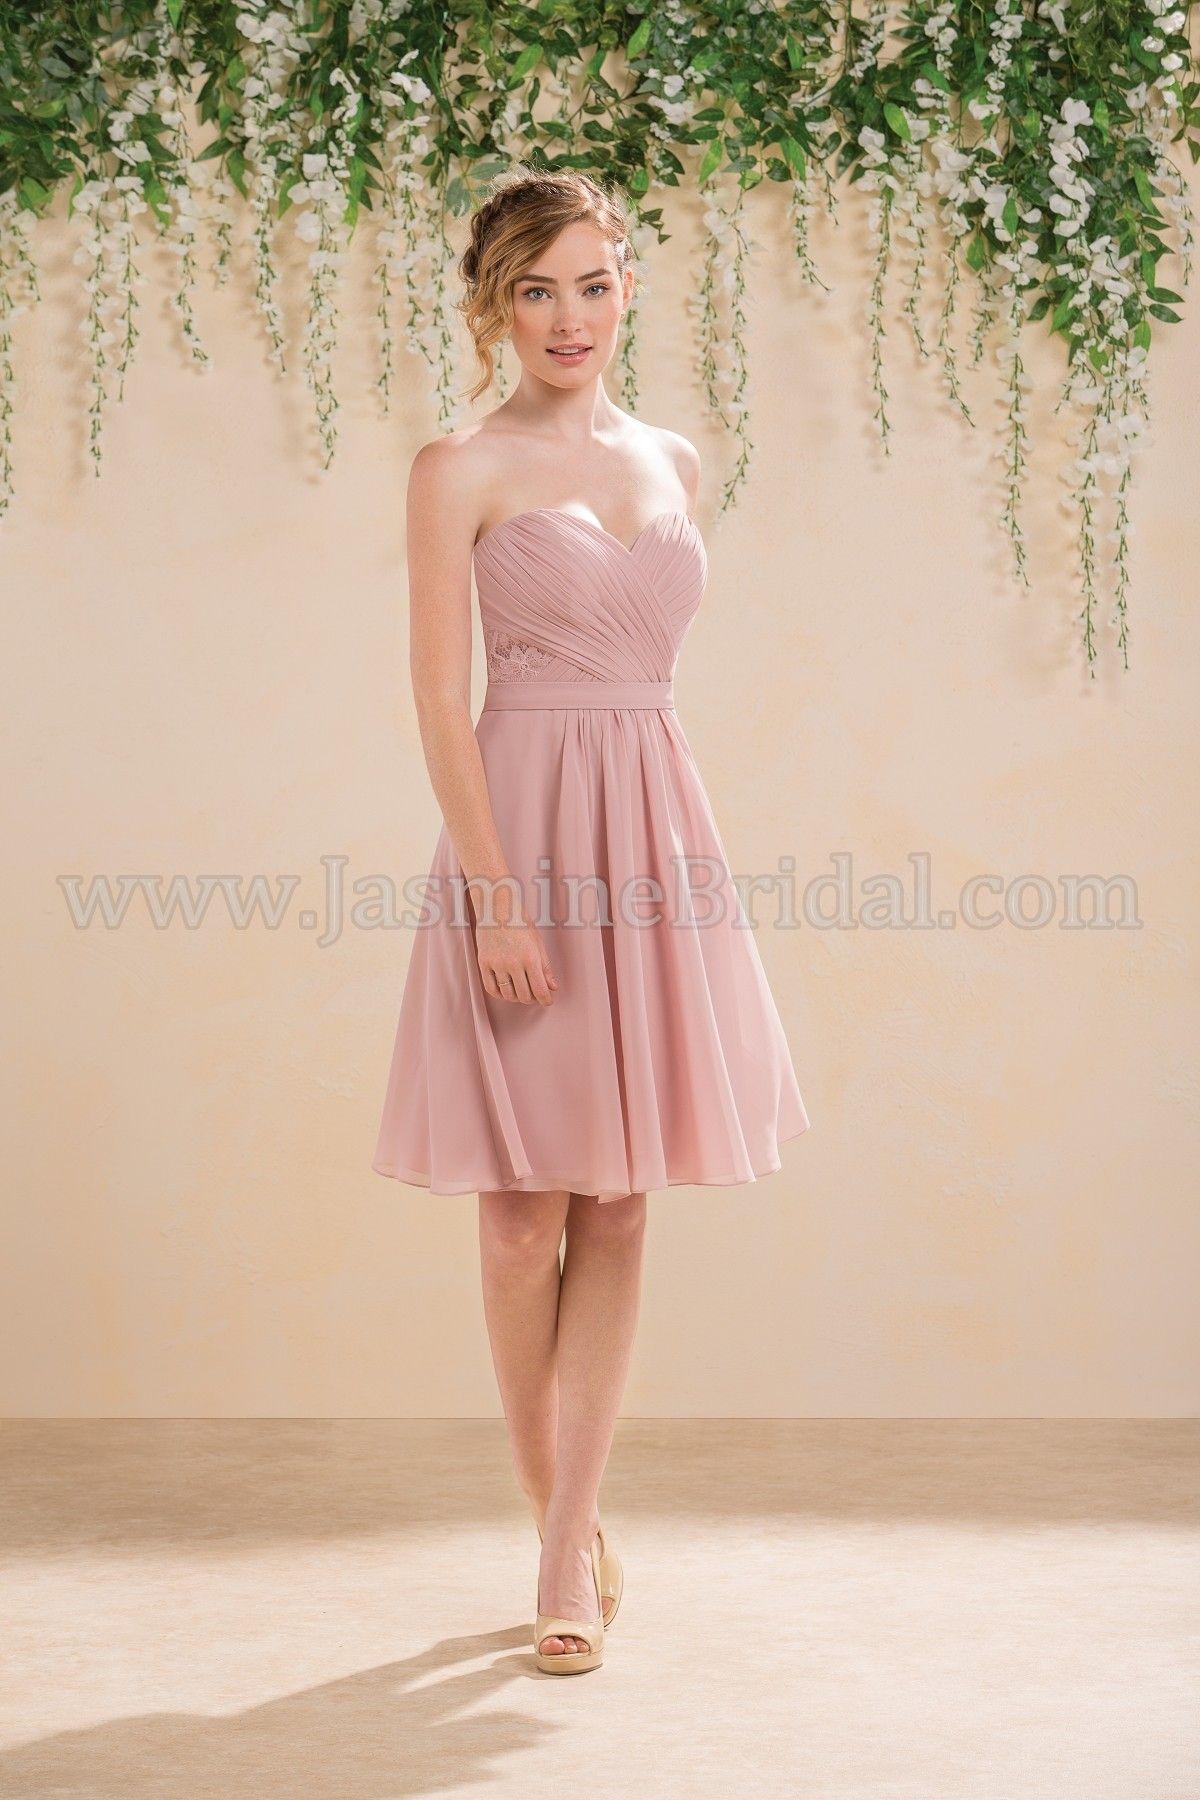 Jasmine Bridal Bridesmaid Dress B2 Style B183001 in Misty Pink ...